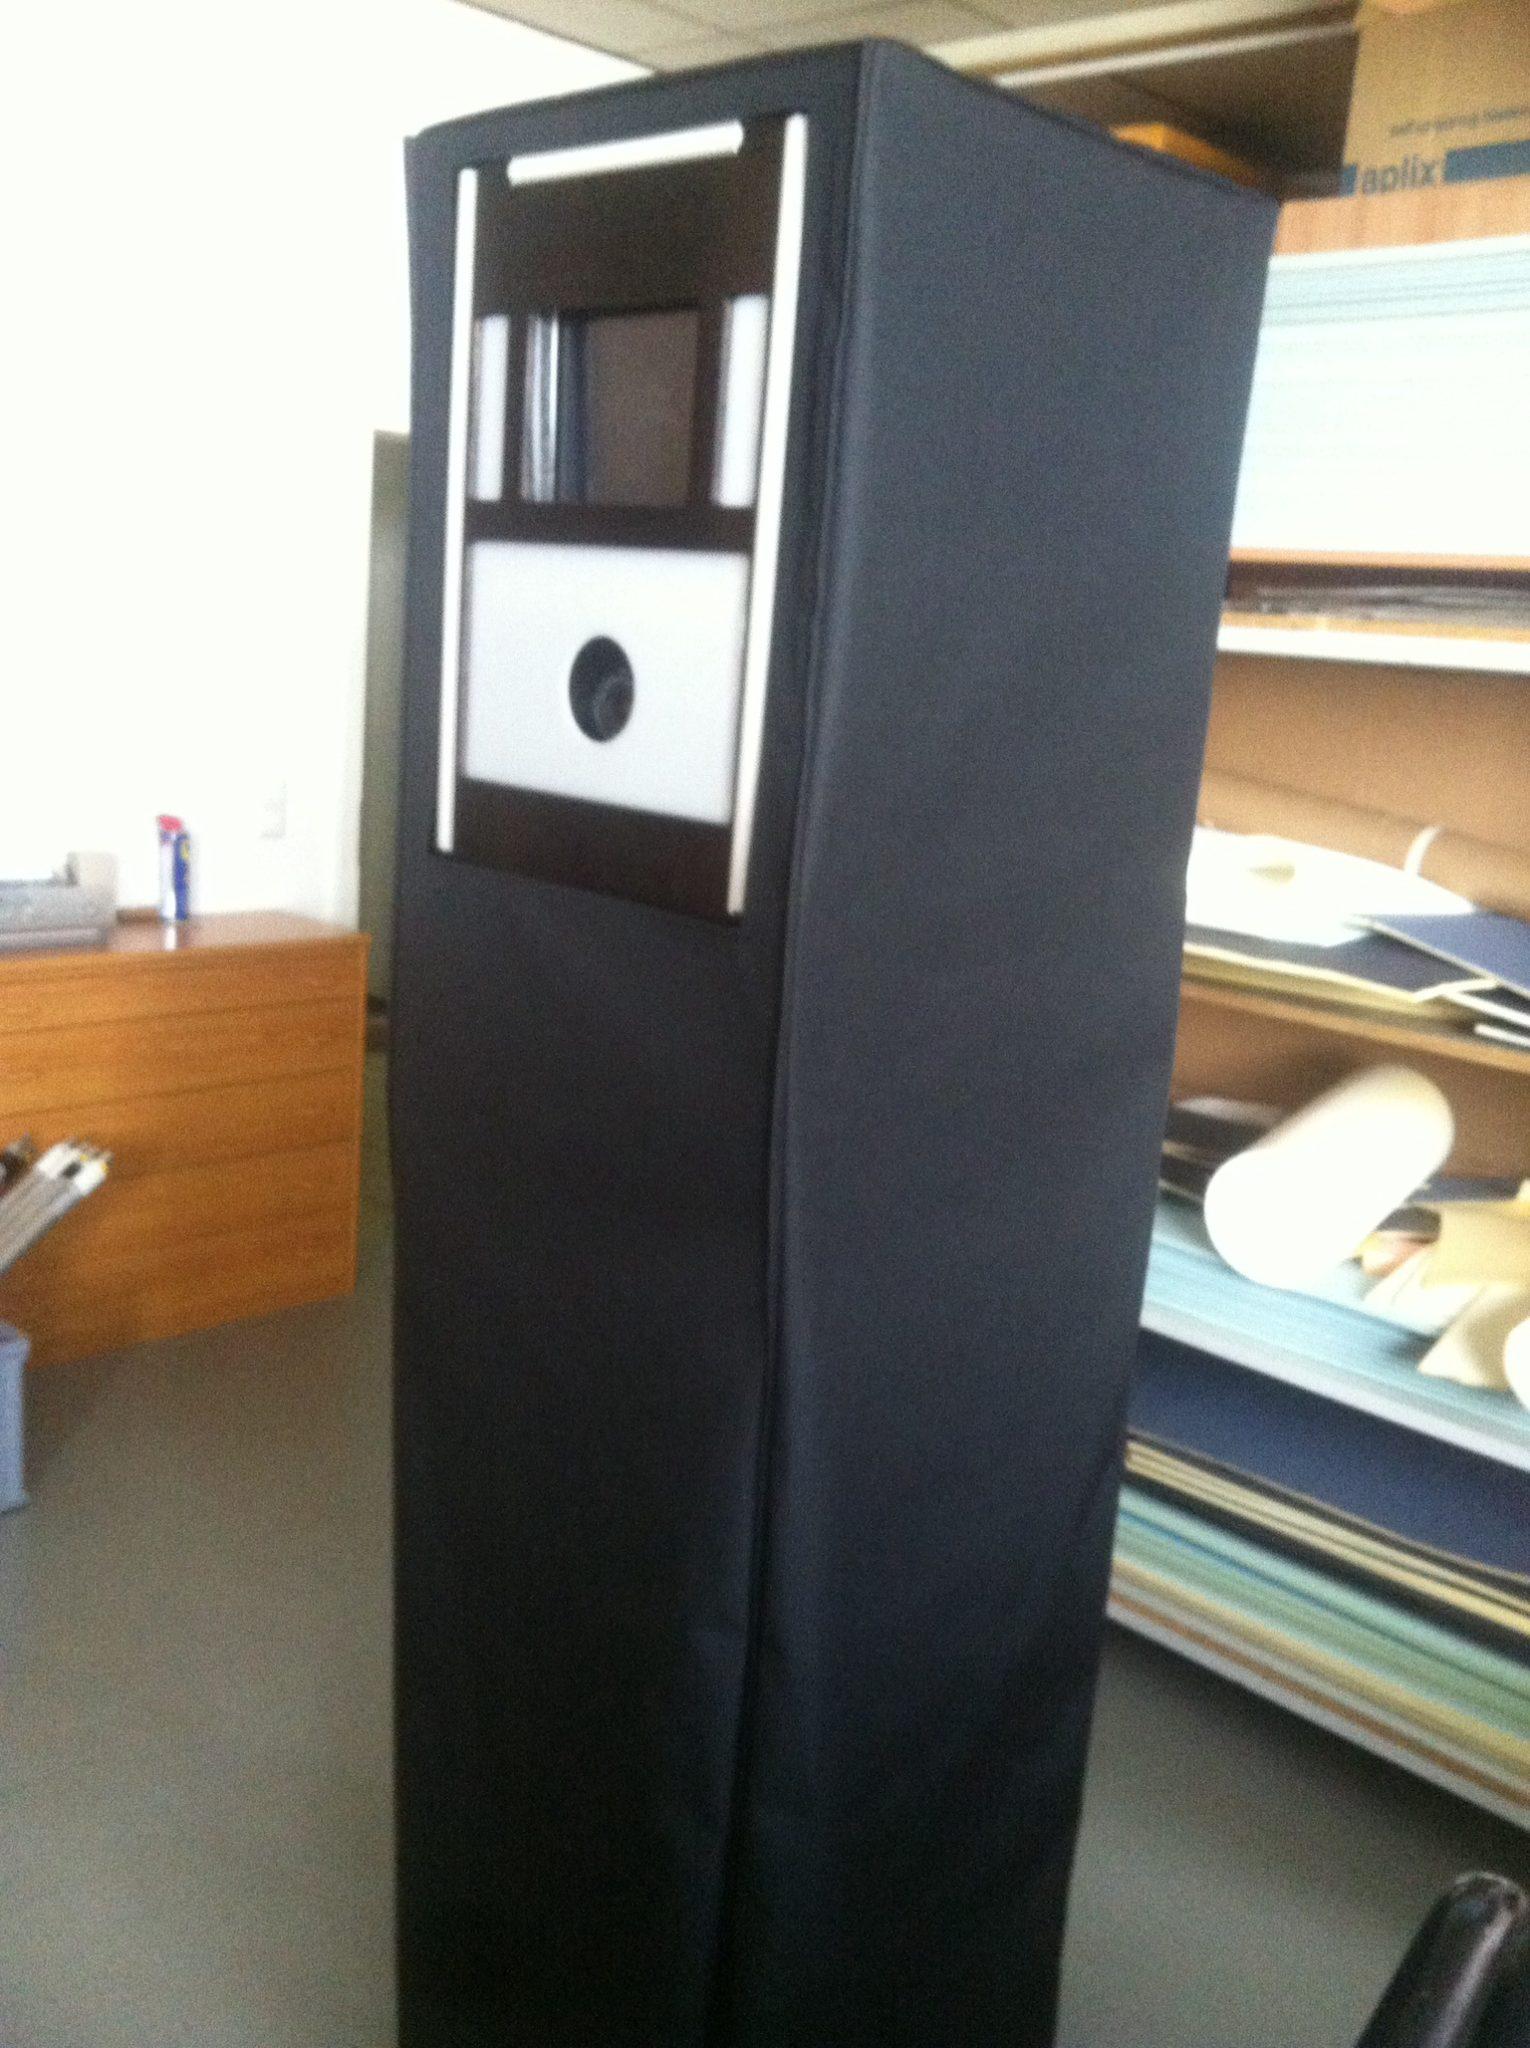 fotoautomat mieten die fotobox. Black Bedroom Furniture Sets. Home Design Ideas